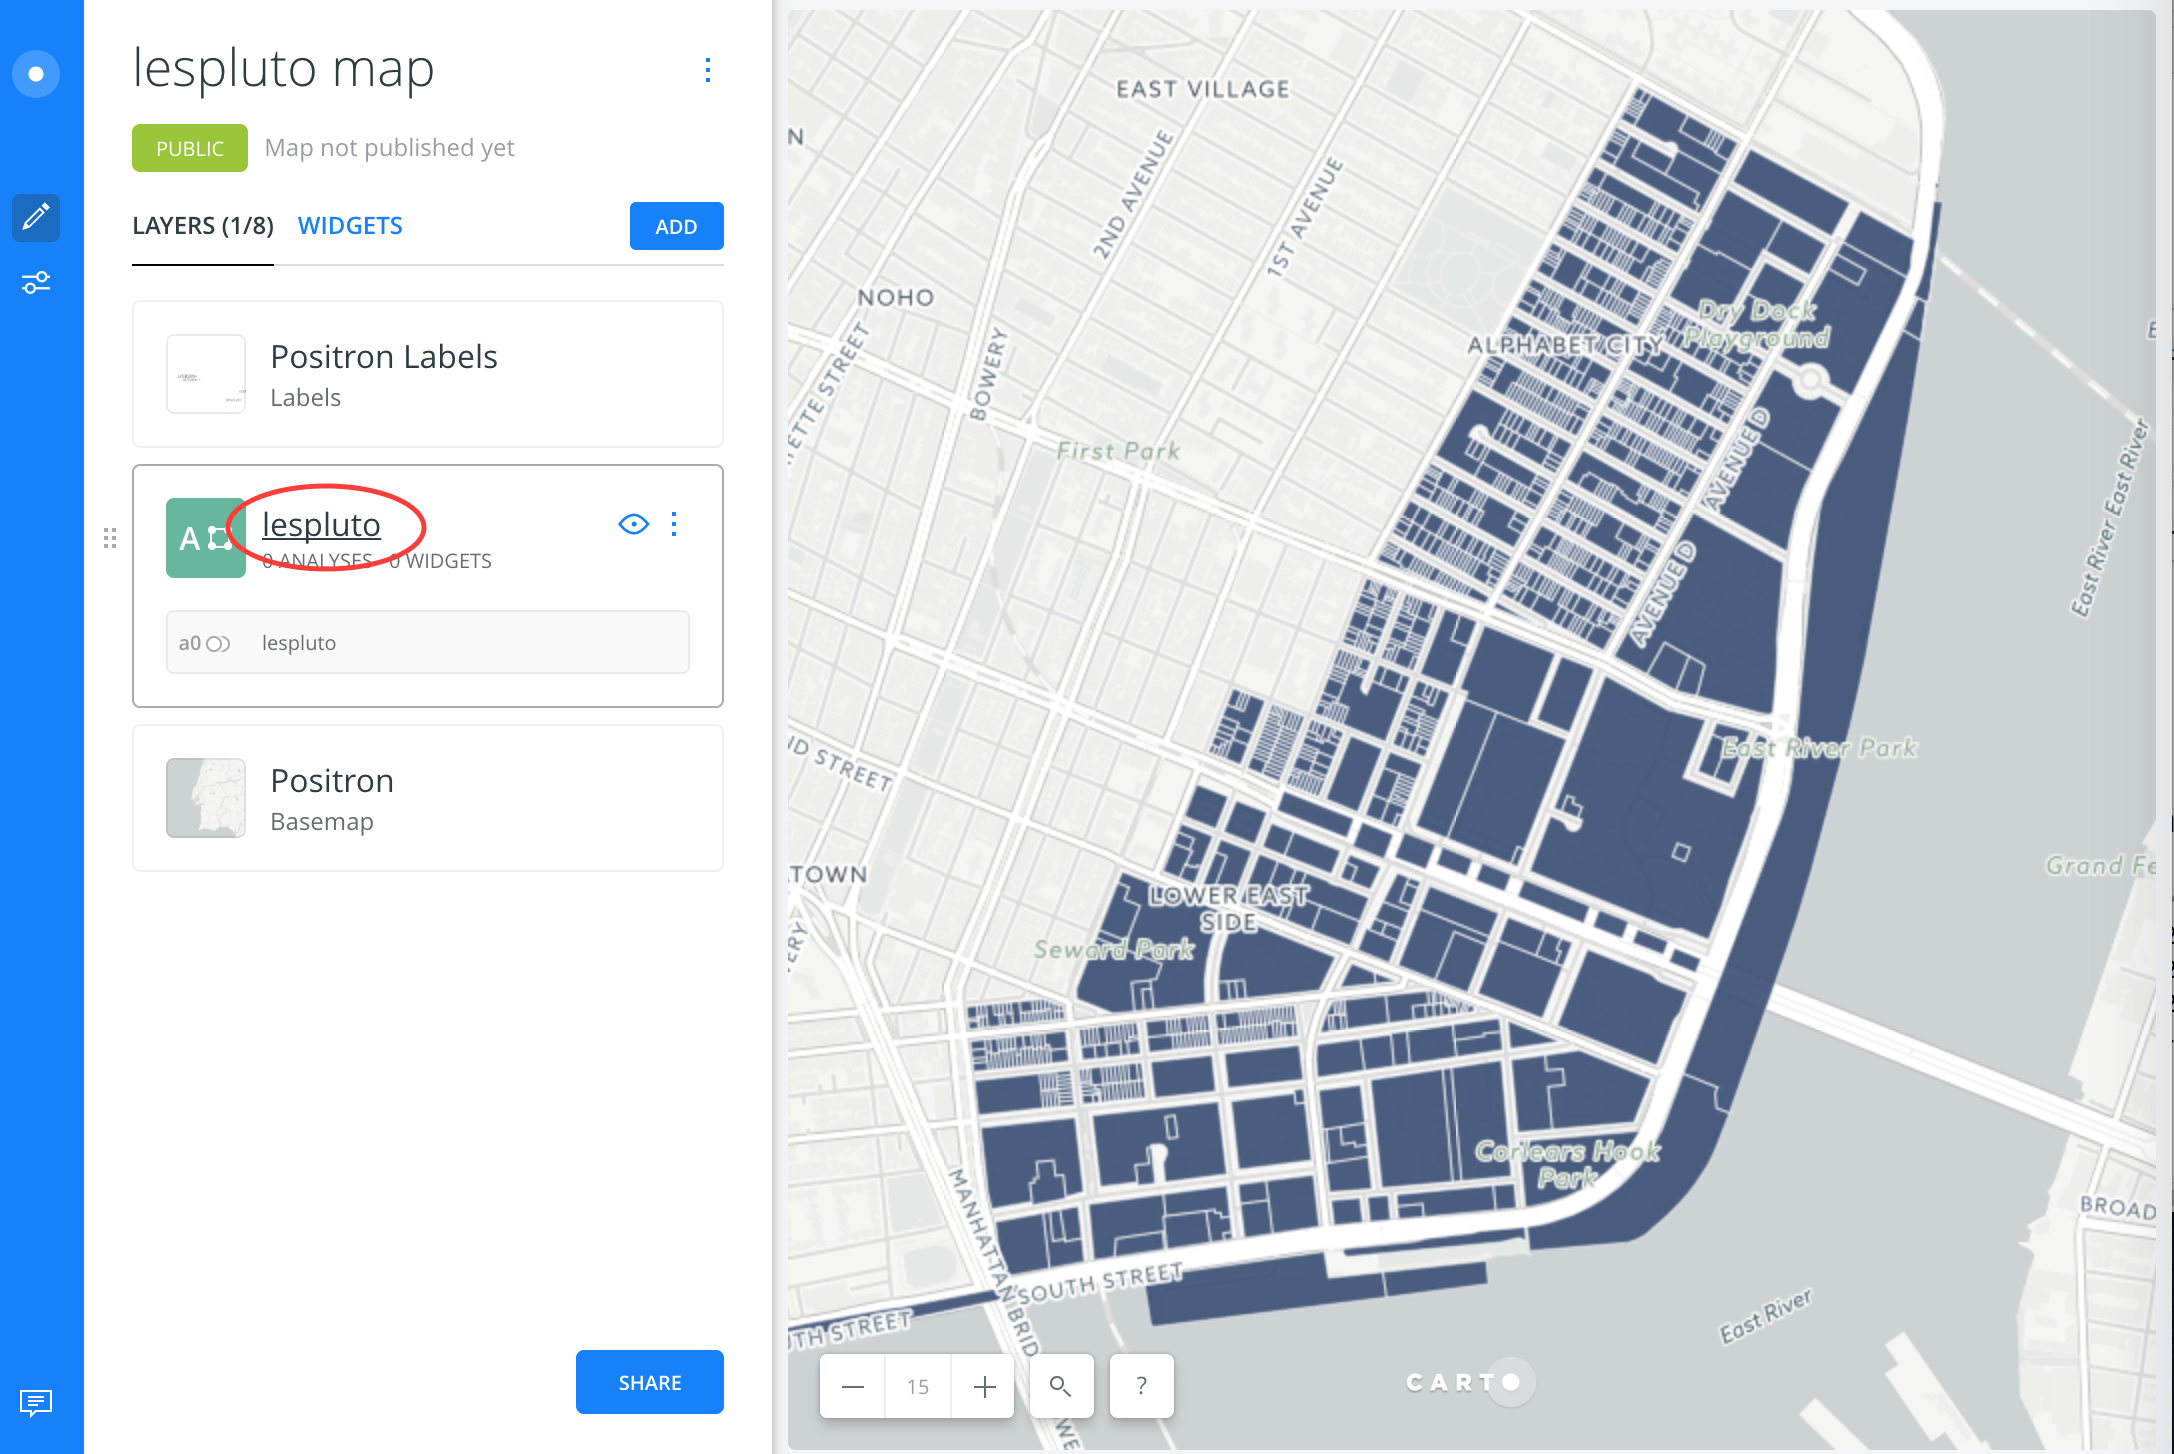 New York Subway Map As Layer.Make A Digital Map With Carto Nycommons